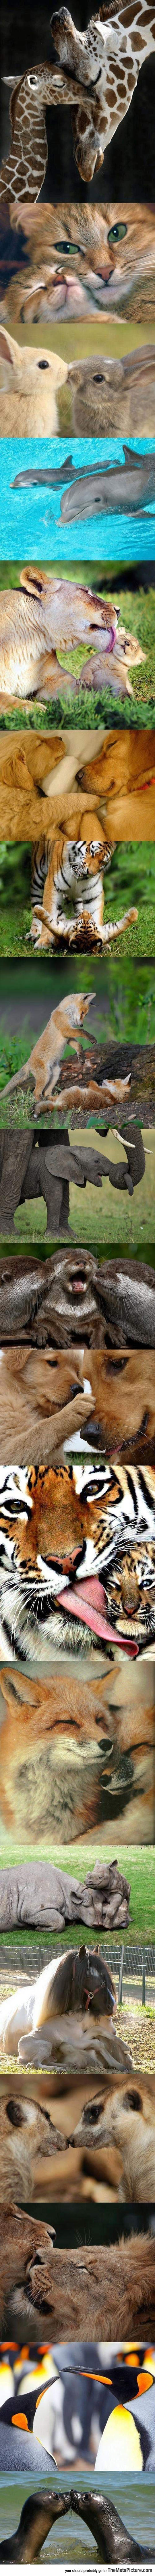 Animal Kingdom Love